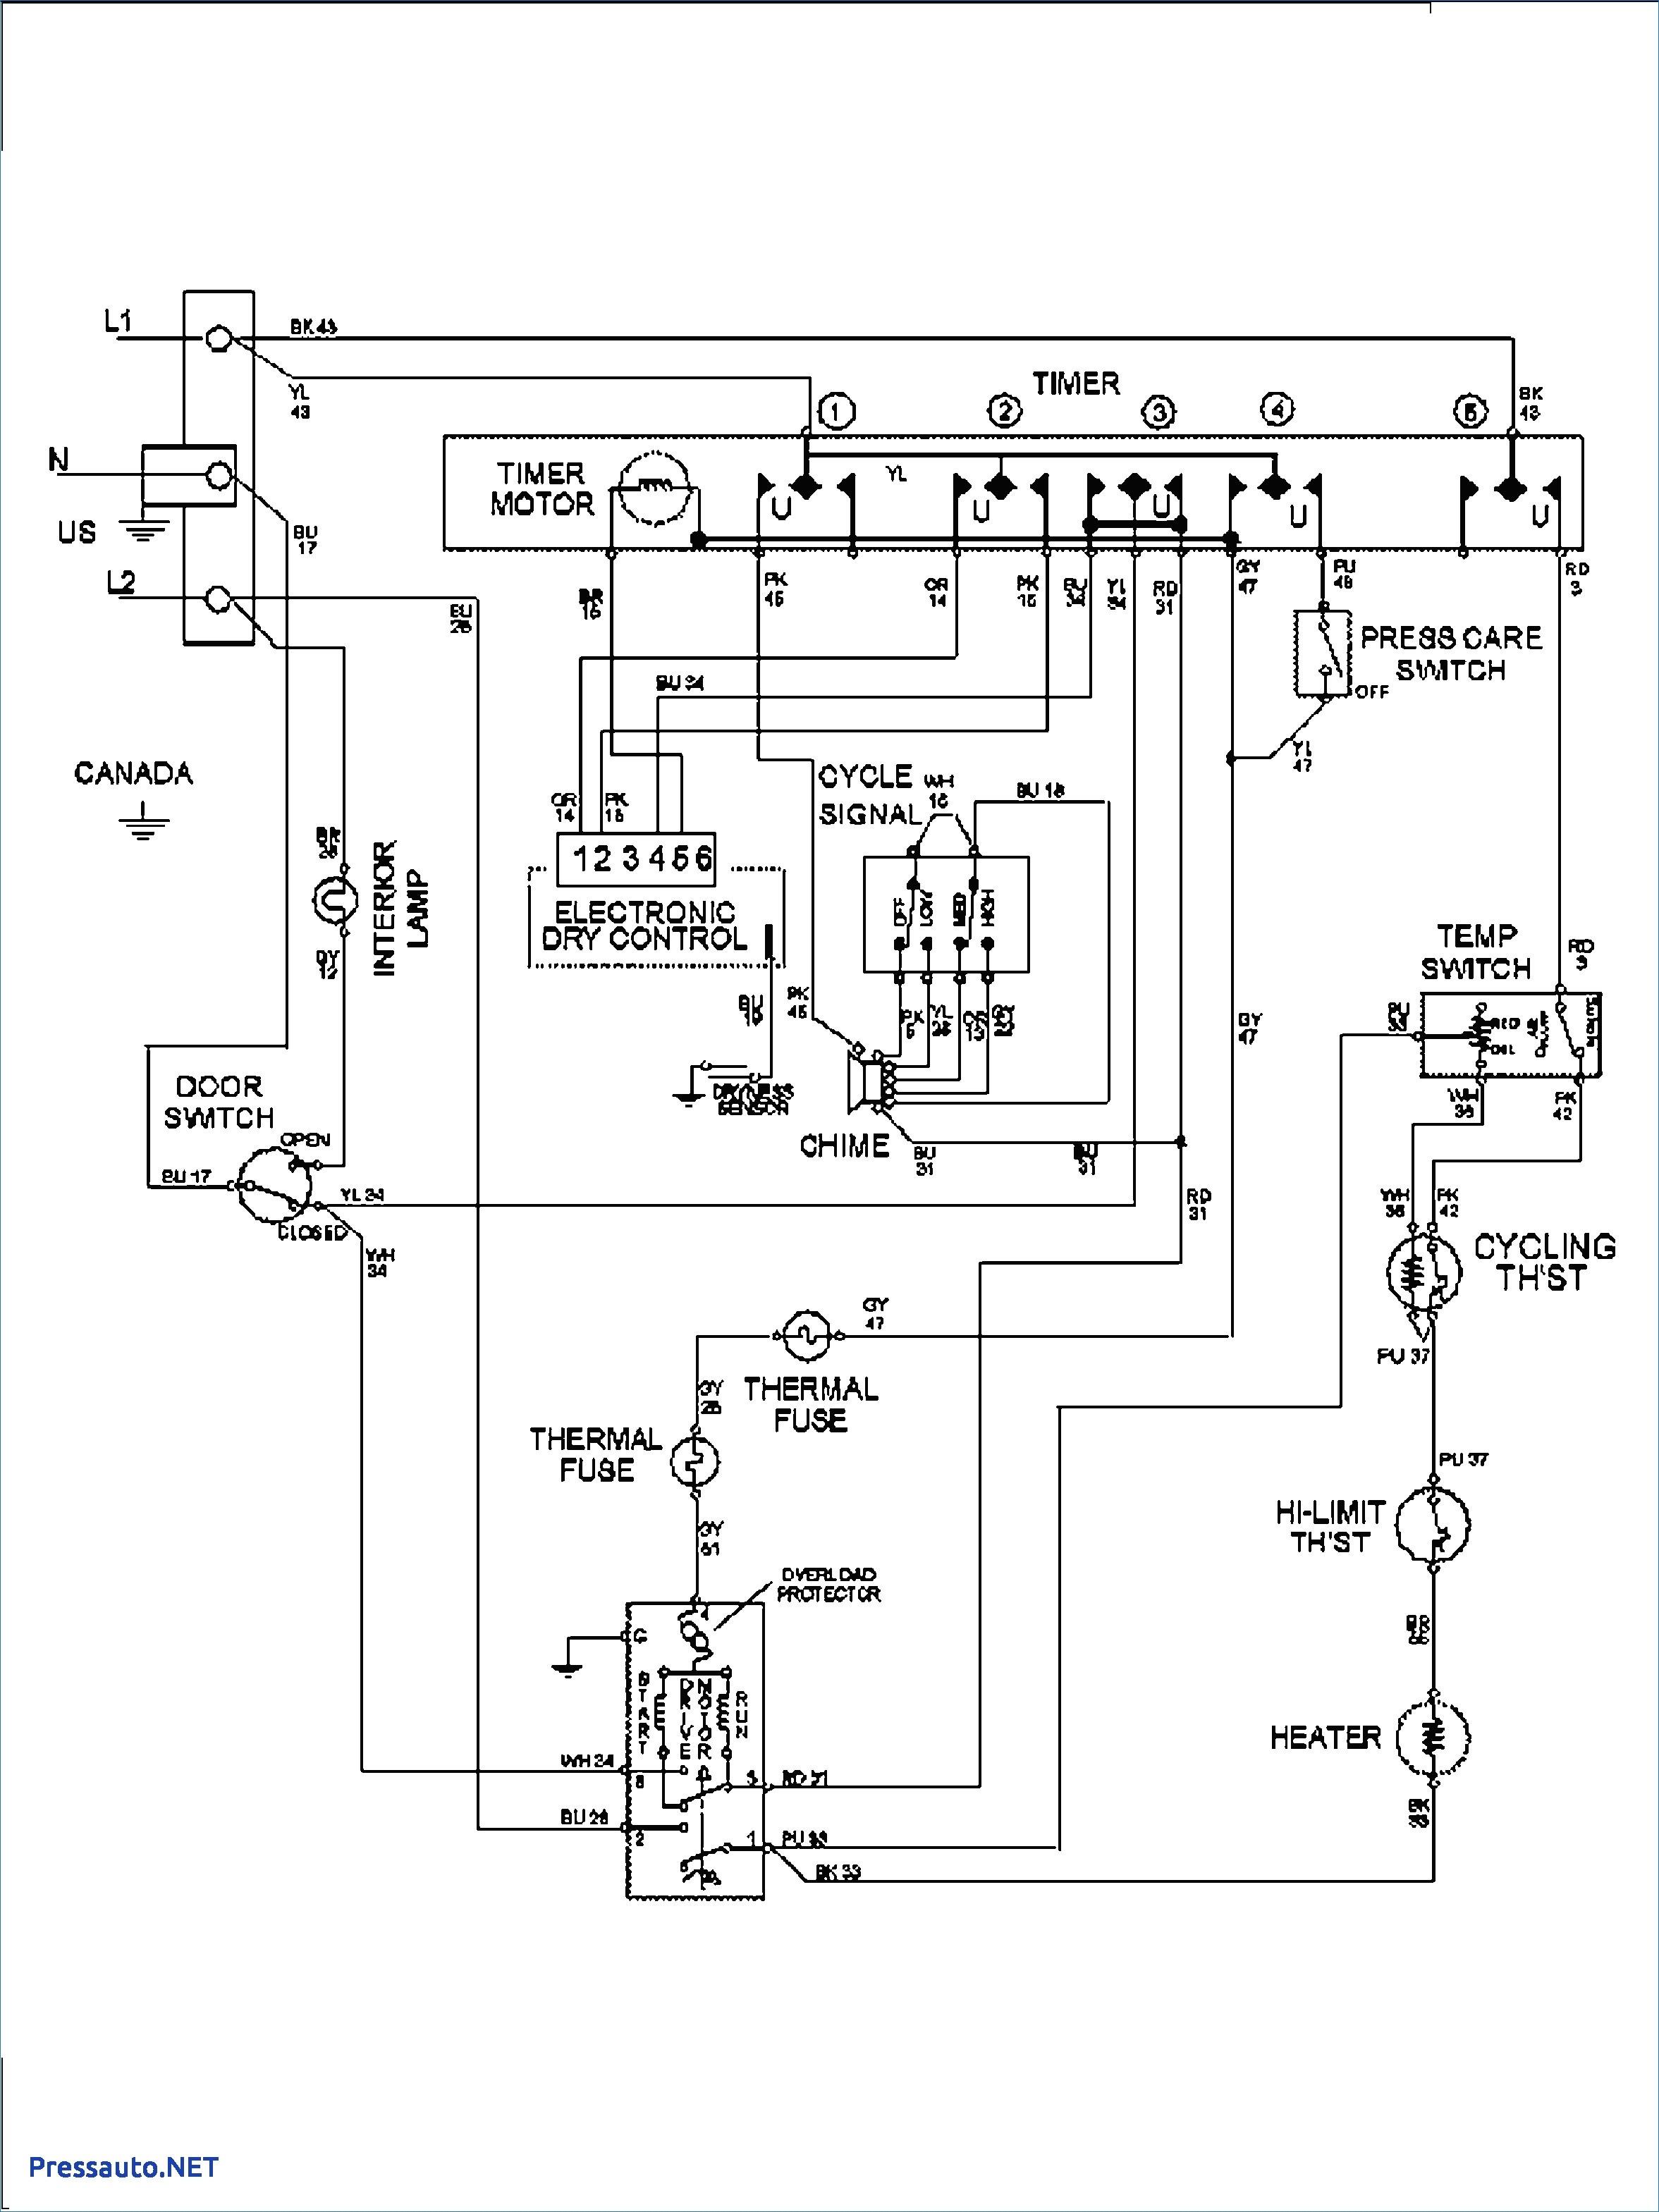 whirlpool dryer schematic wiring diagram Collection-Wiring Diagram Dryer Motor New Ge Inspirational 15 0 Stunning Whirlpool Dryer Schematic Wiring Diagram 7-q